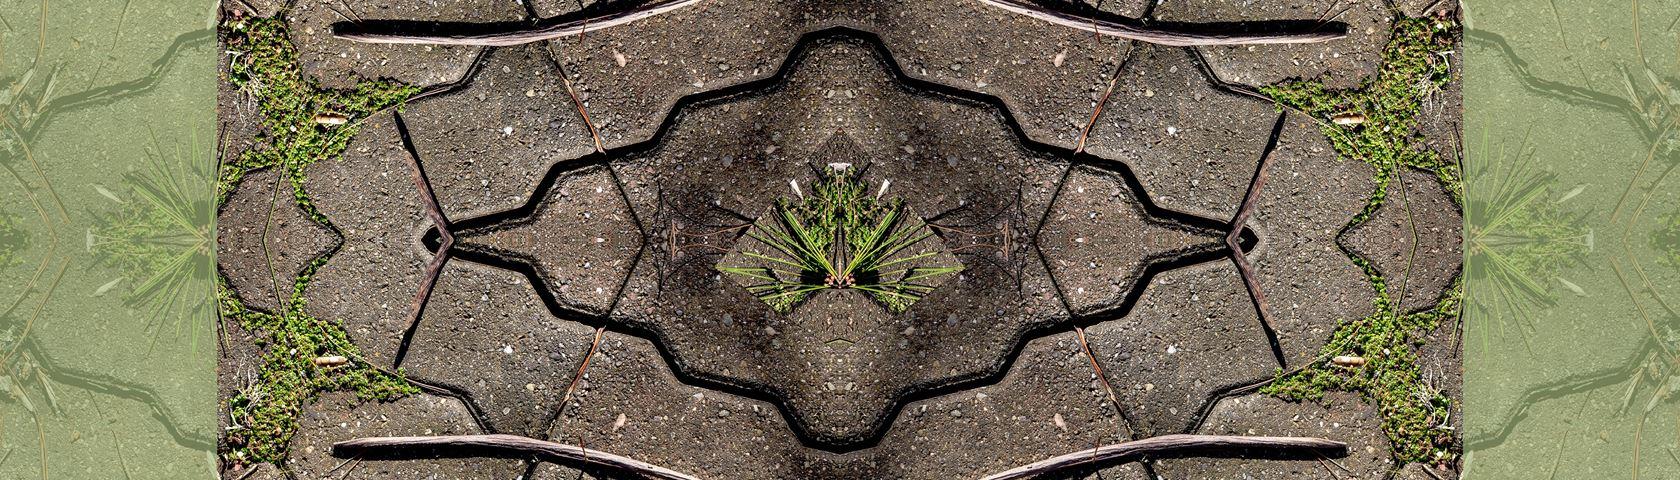 Pine Needles and Pavement Symmetry